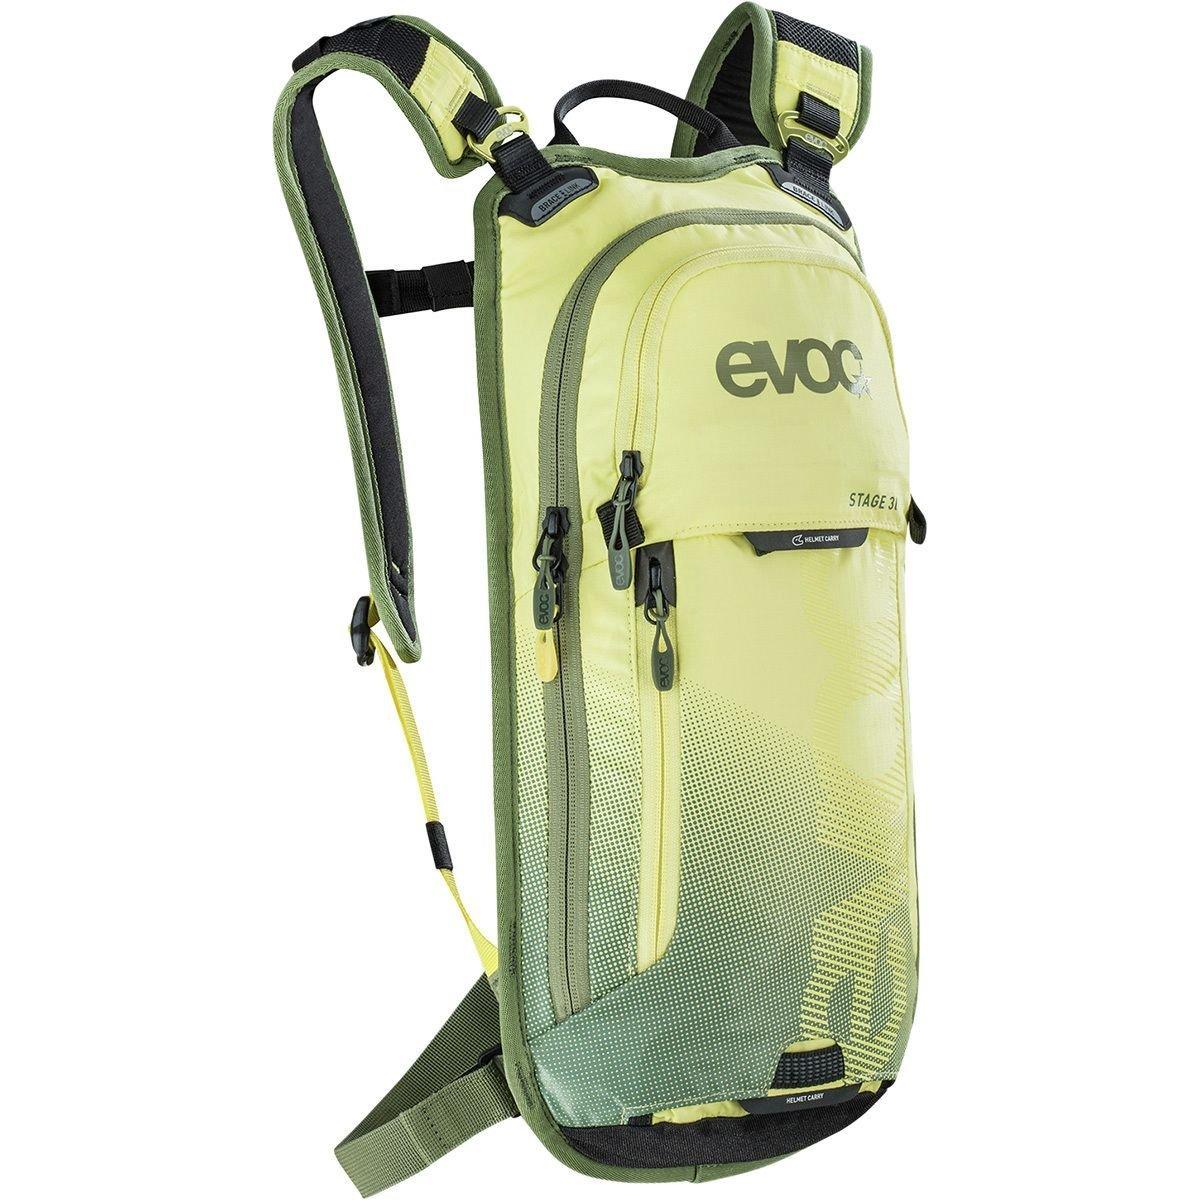 Evoc yellow-lightオリーブステージ – with 2 Litre膀胱 – 3リットル水和パックWi (デフォルト、イエロー)   B073WDZQX1